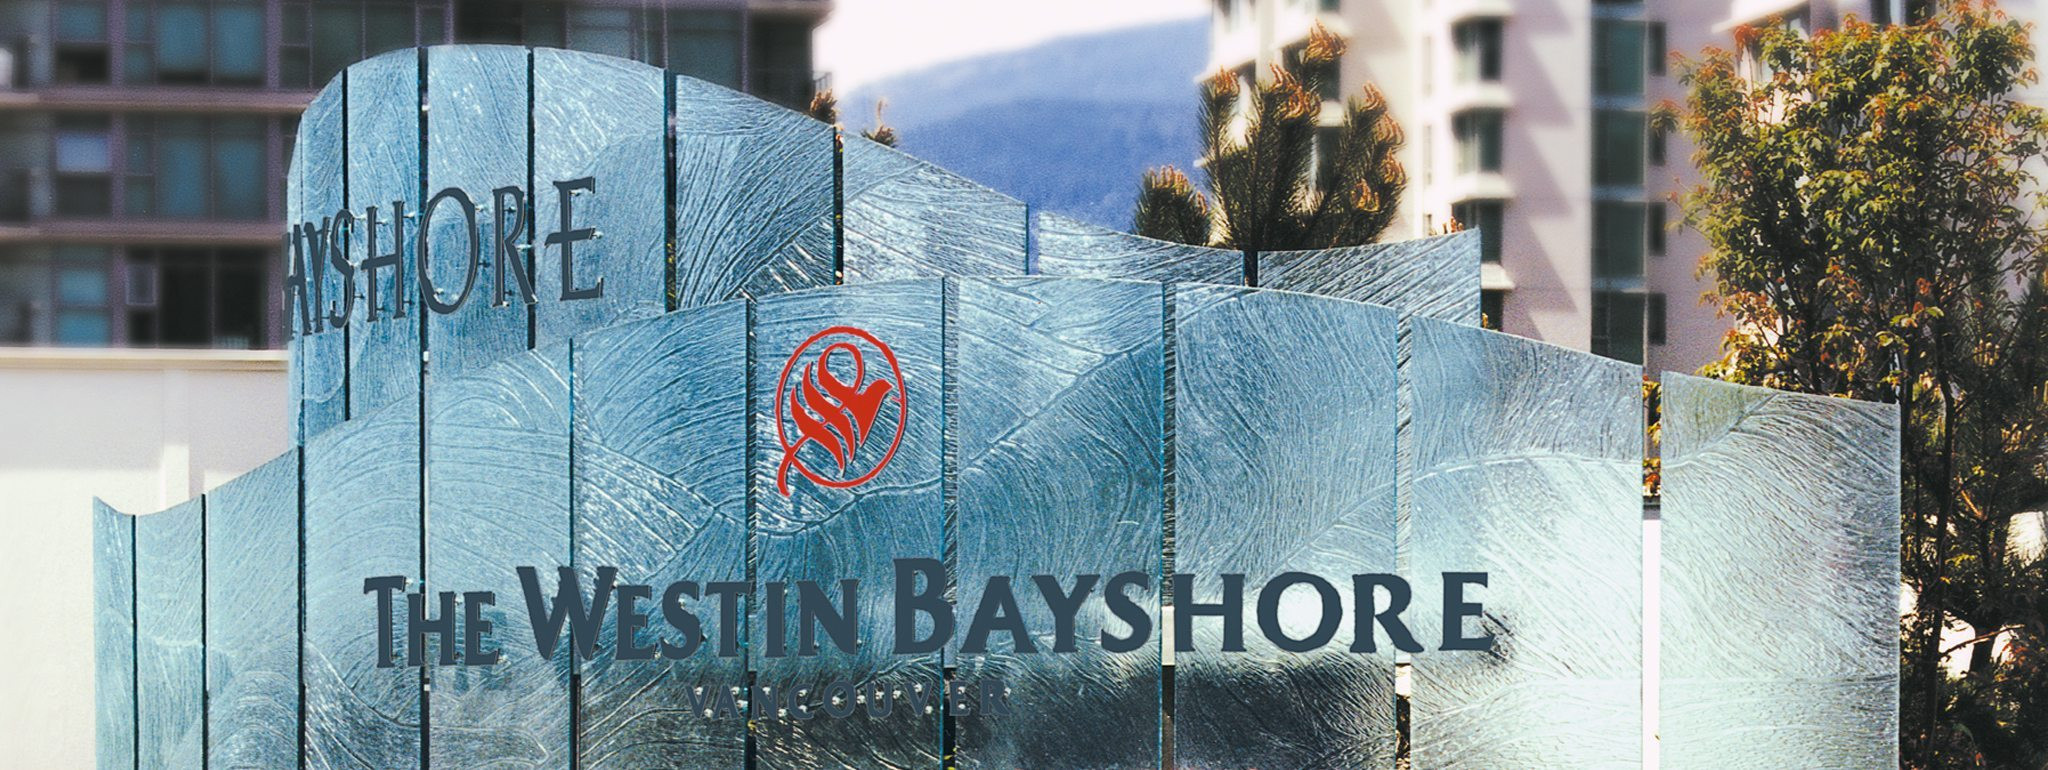 westin-bayshore-frame.jpg